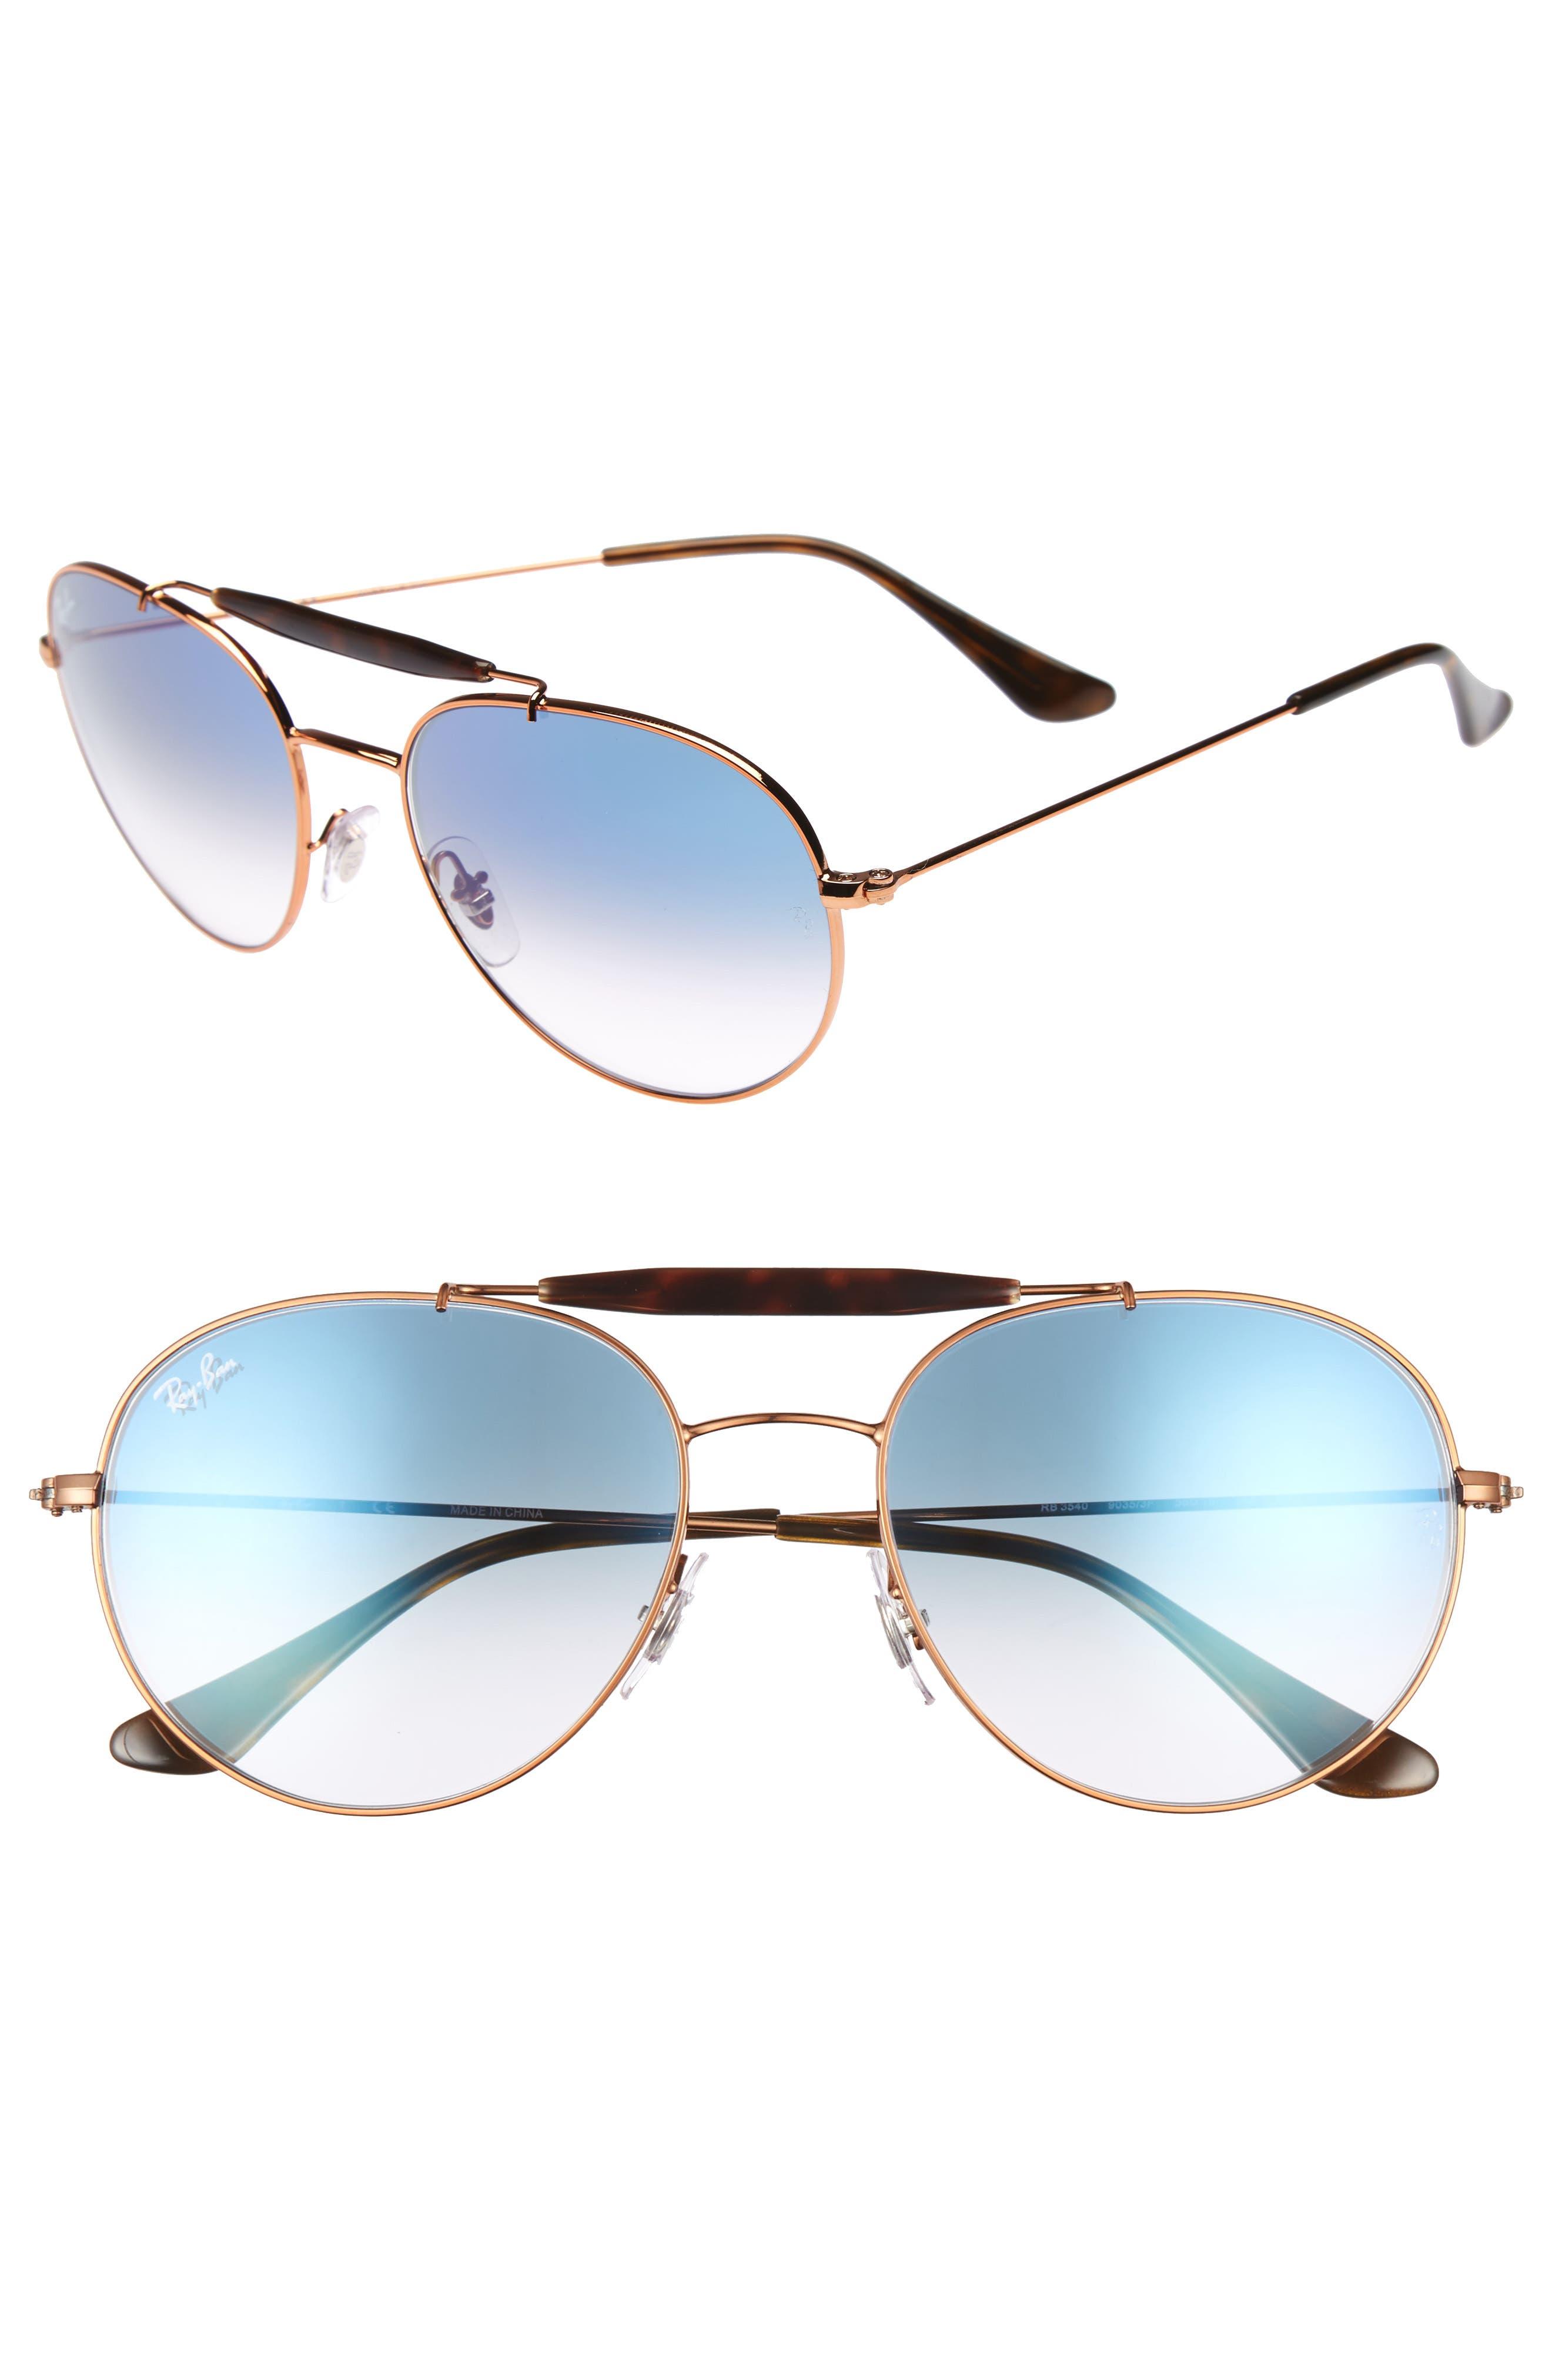 Highstreet 56mm Sunglasses,                             Main thumbnail 1, color,                             220